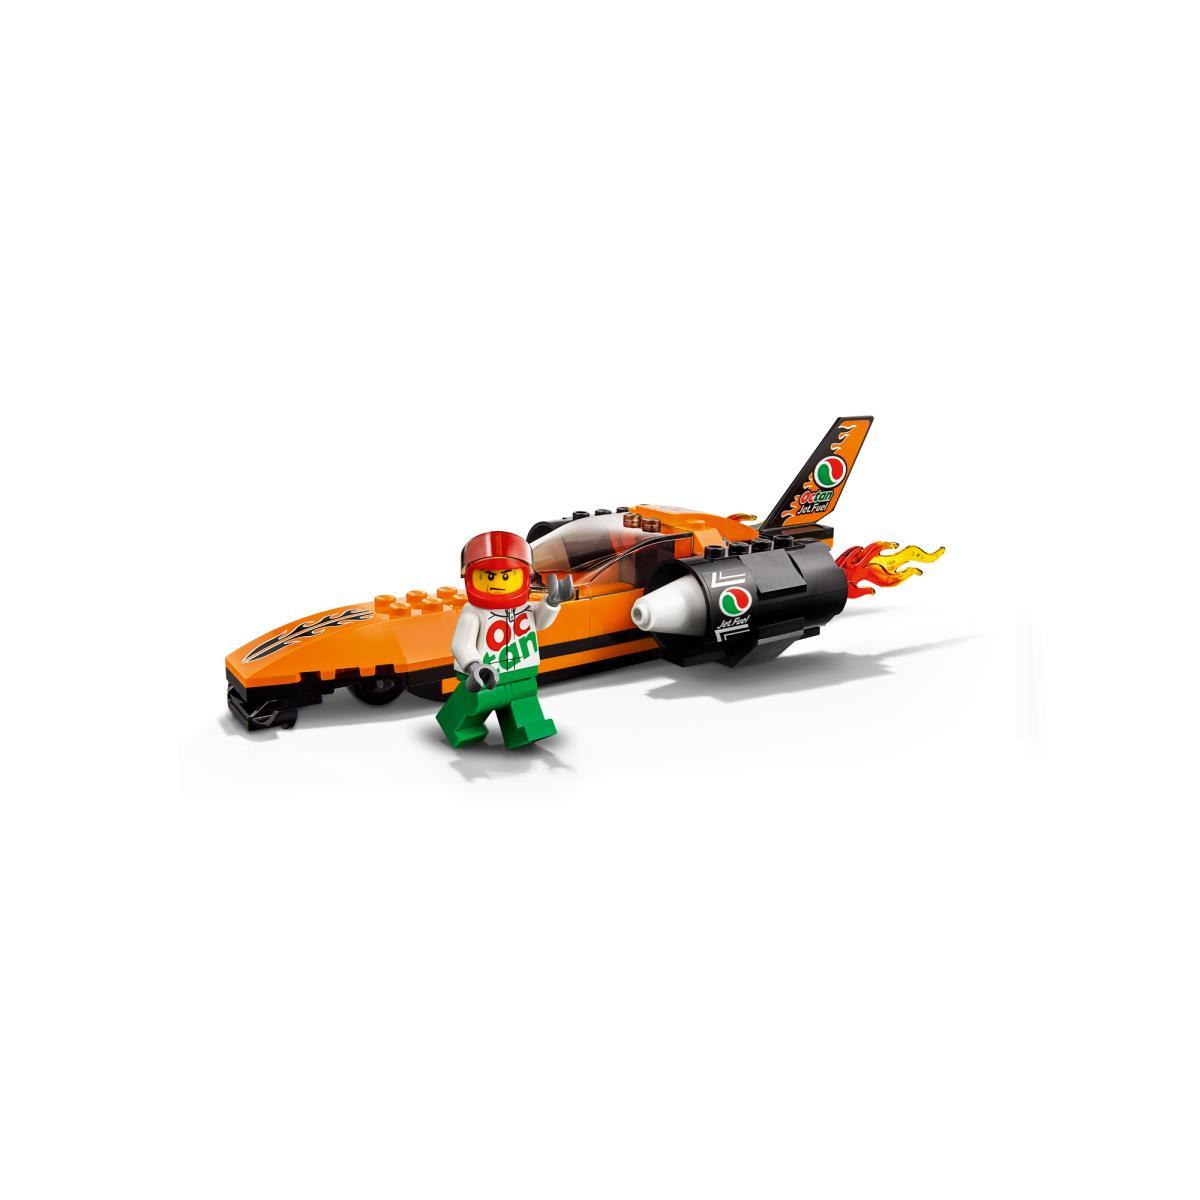 LEGO City 60178 Raketenauto,Lego,000051353794, 5702016075168